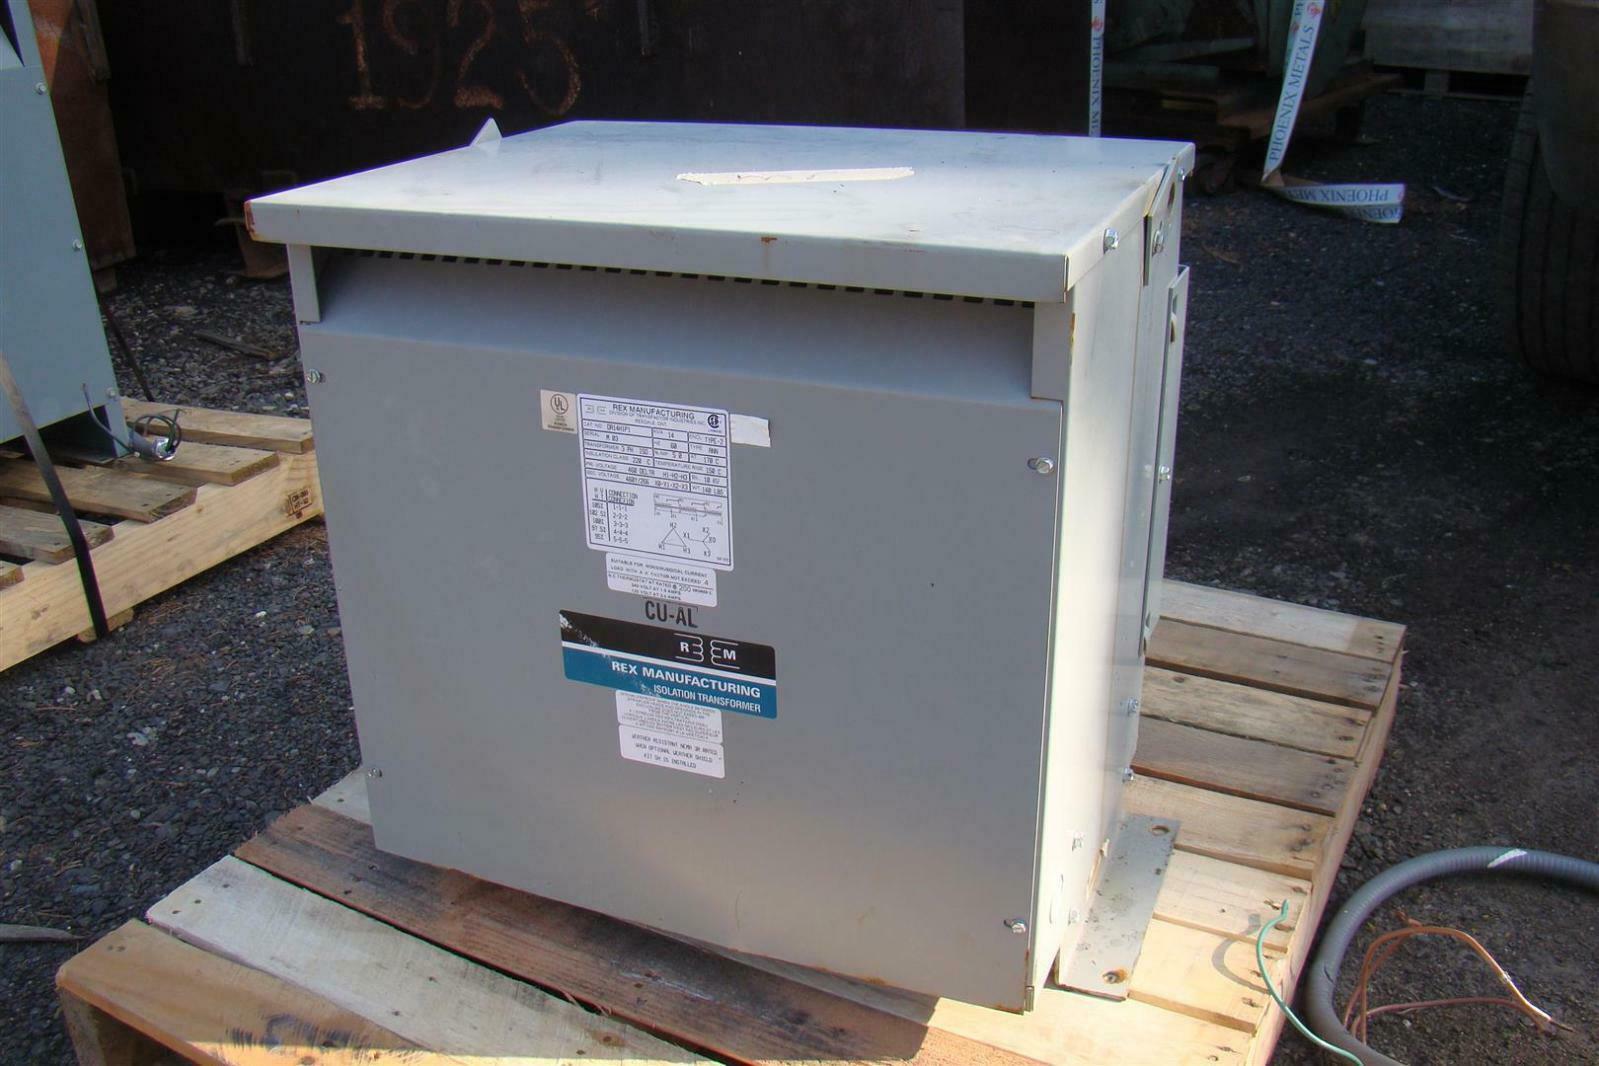 square d isolation transformer wiring diagram car sub rex manufacturing 14kva 3ph pri 460v